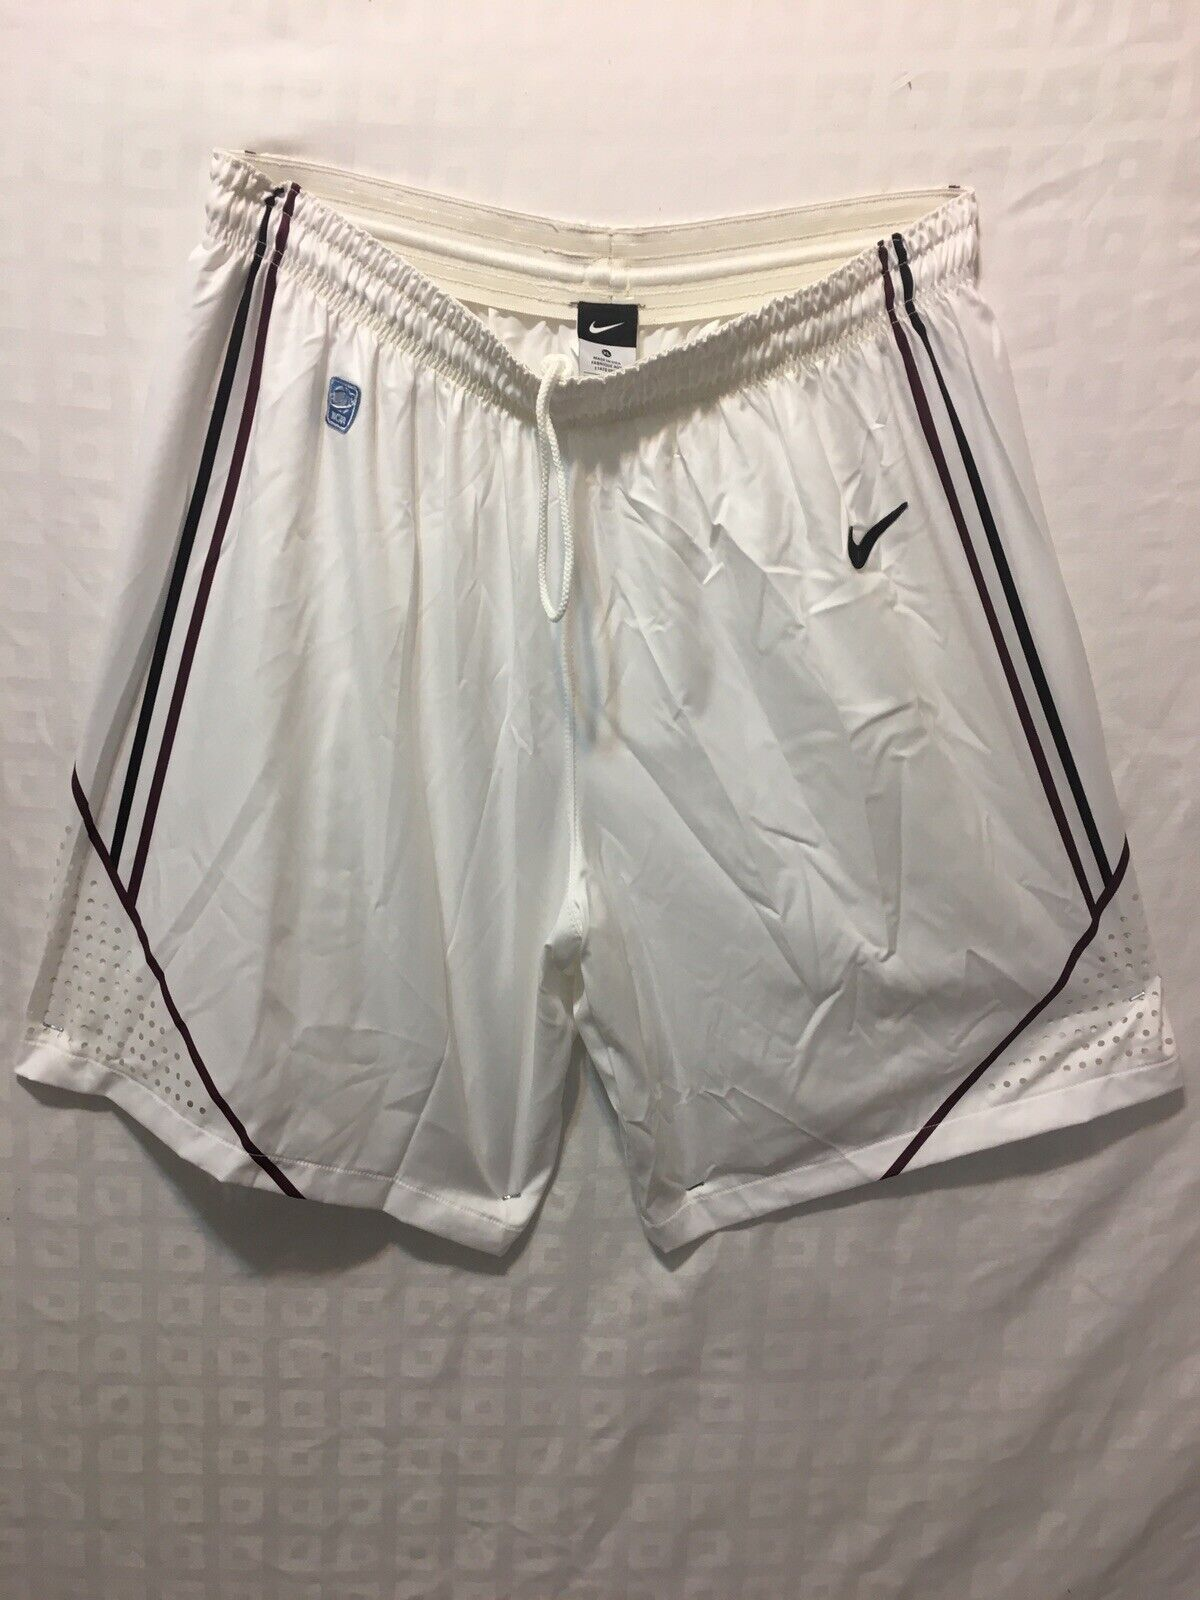 harvard university authentic gameday basketball shorts 2